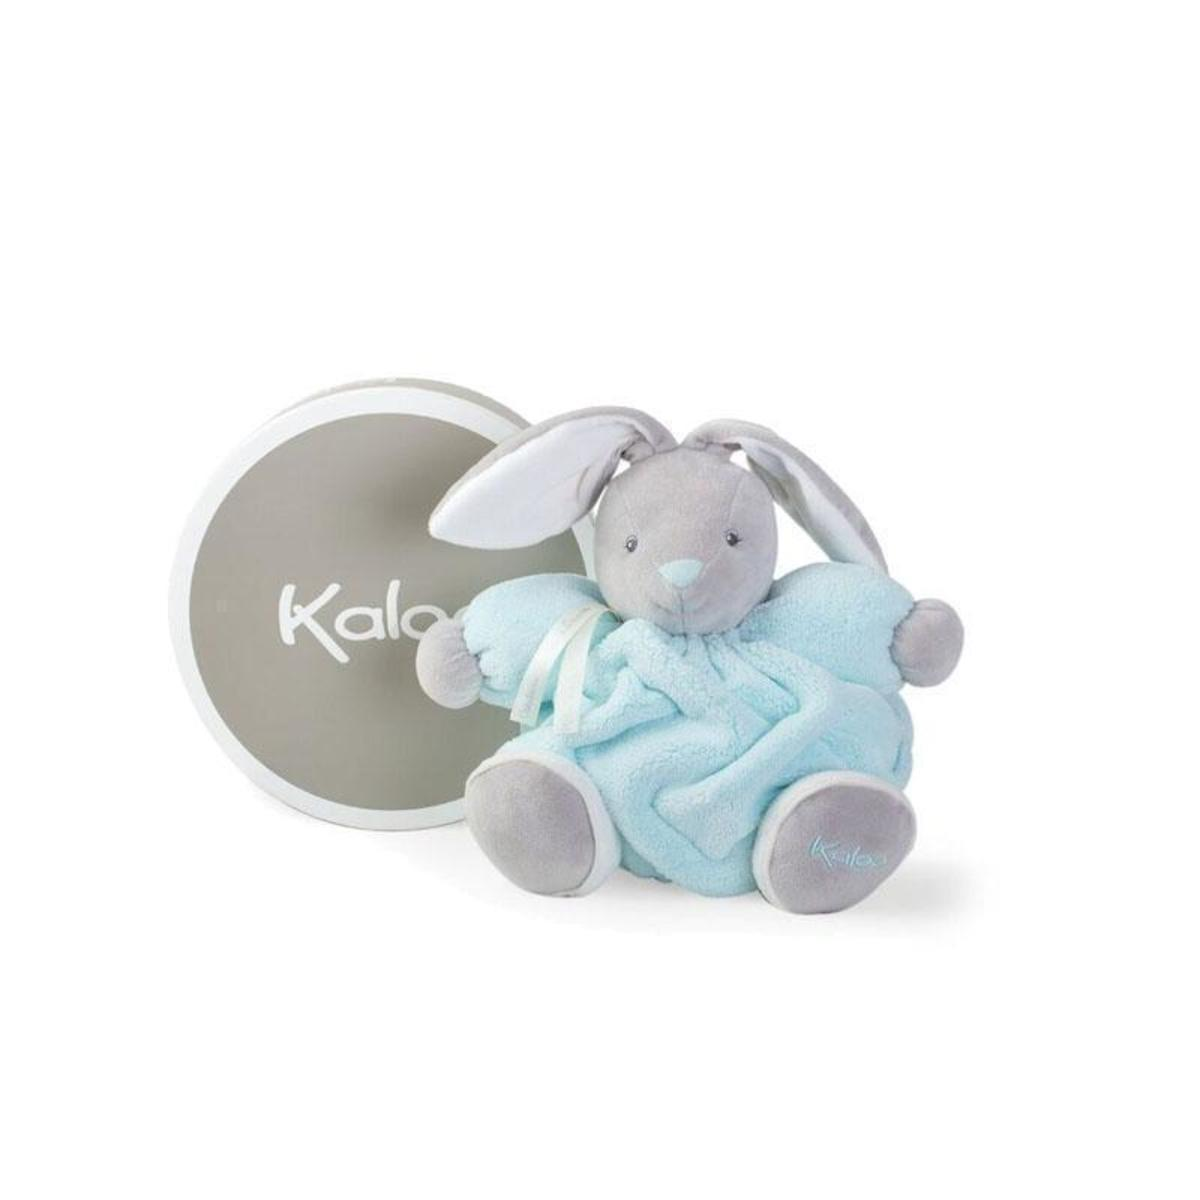 Kaloo Plume Bunny Rabbit (中) French Brand (2 colors) - Light blue